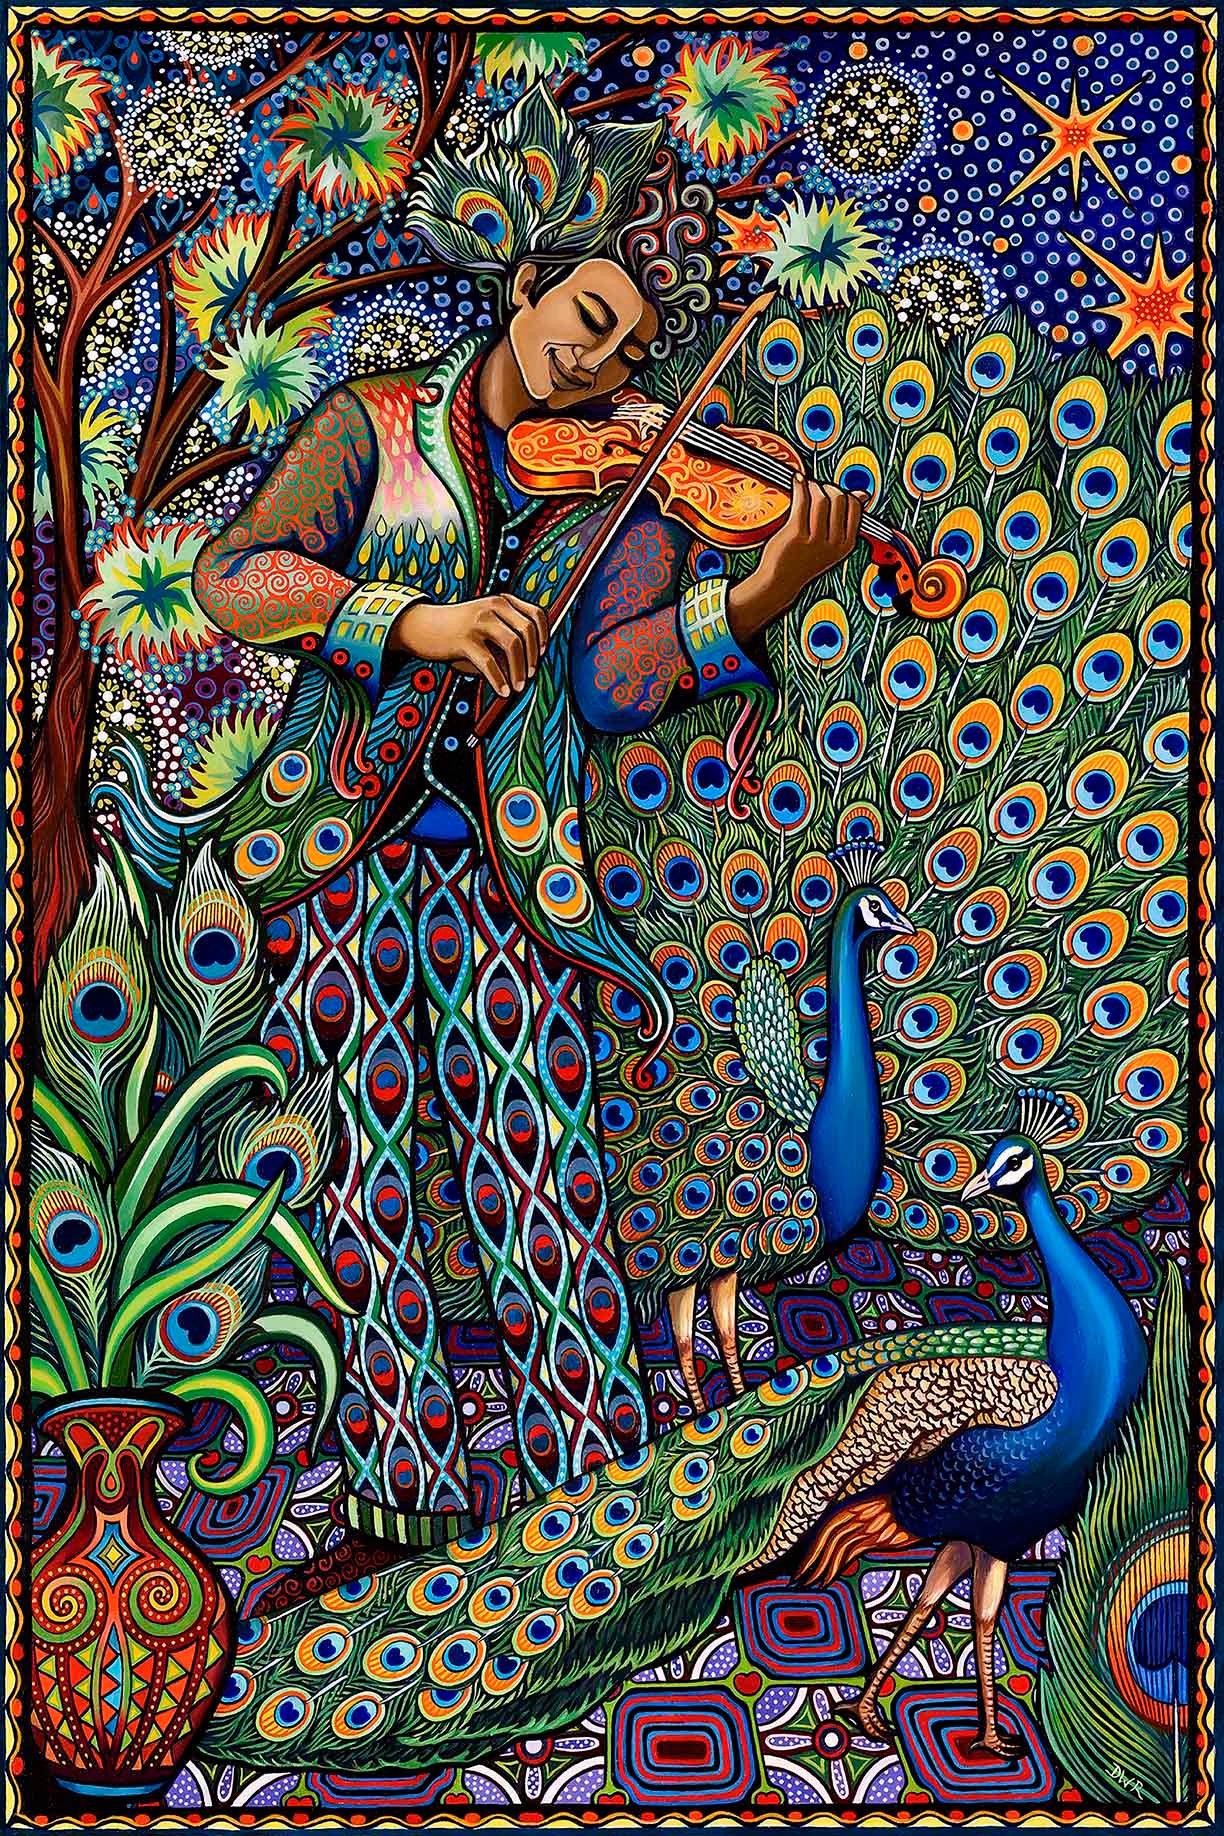 Image of The Serenade